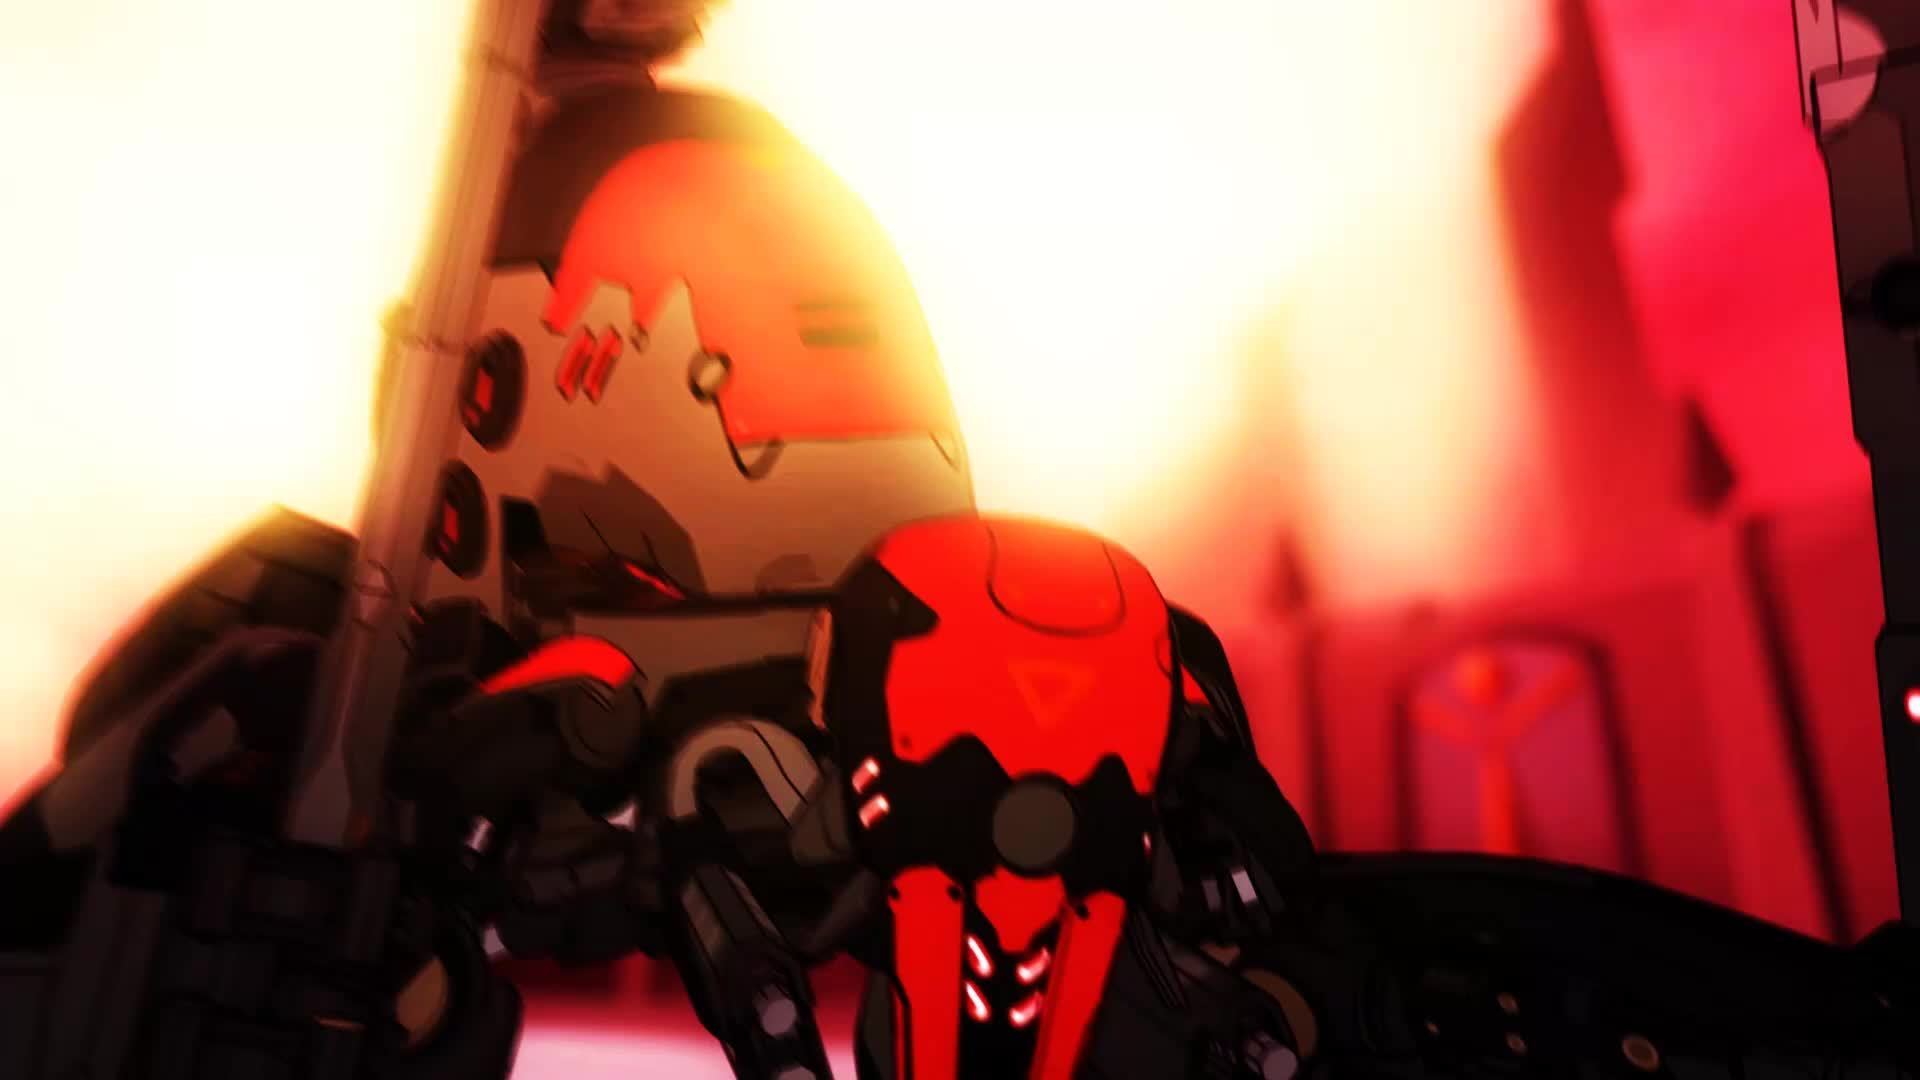 battleborn, epic, rath, Battleborn GIFs